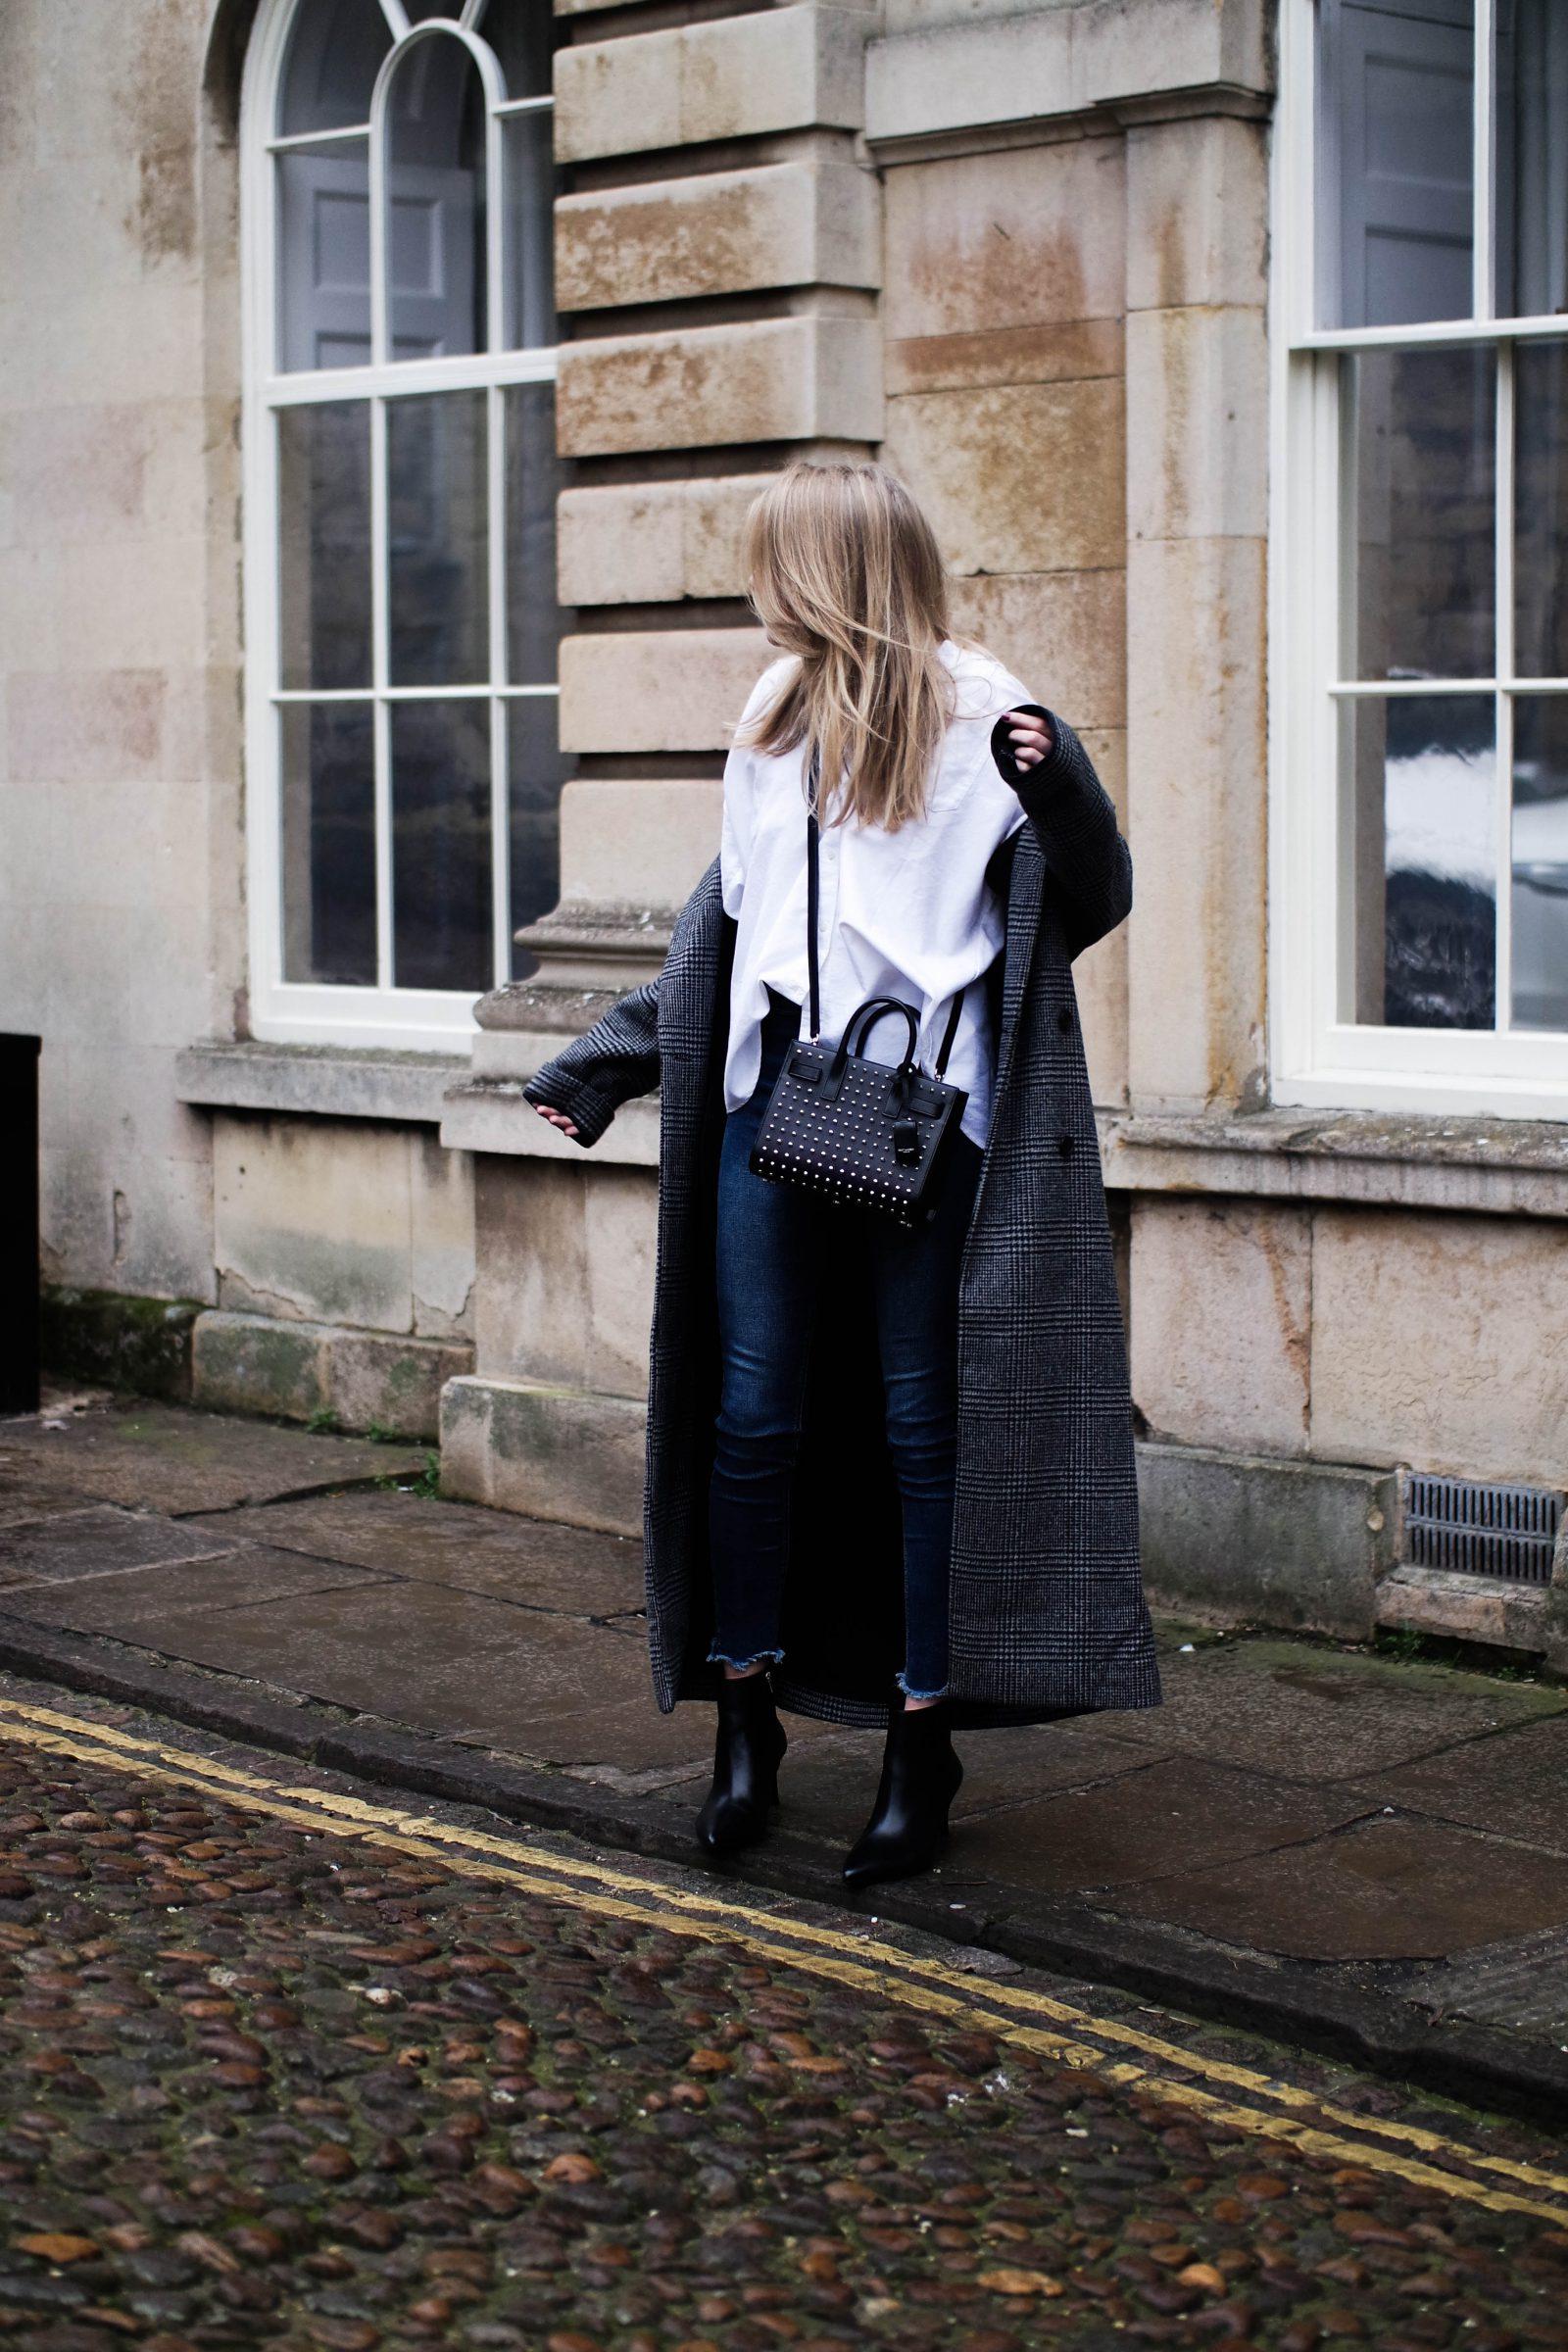 Say Hello To Saint (laurent) - Fashion Blogger Street Style